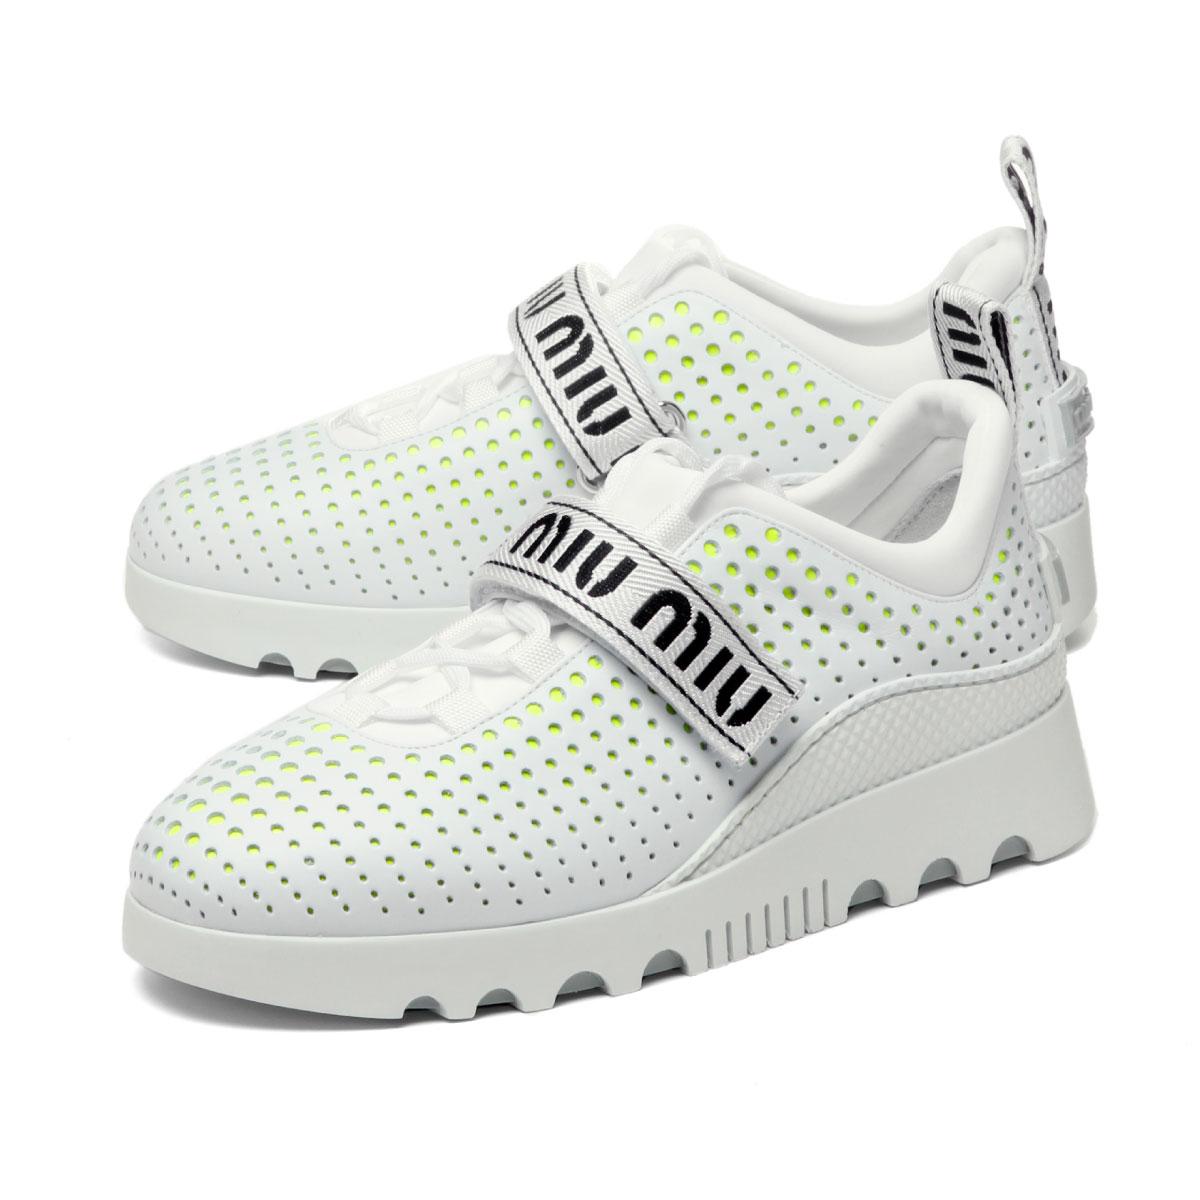 free shipping c7530 b4625 ミュウミュウ MIU MIU shoes Lady's 5E313C 3KRL F0I87 sneakers BIANCO+GIALLO F white